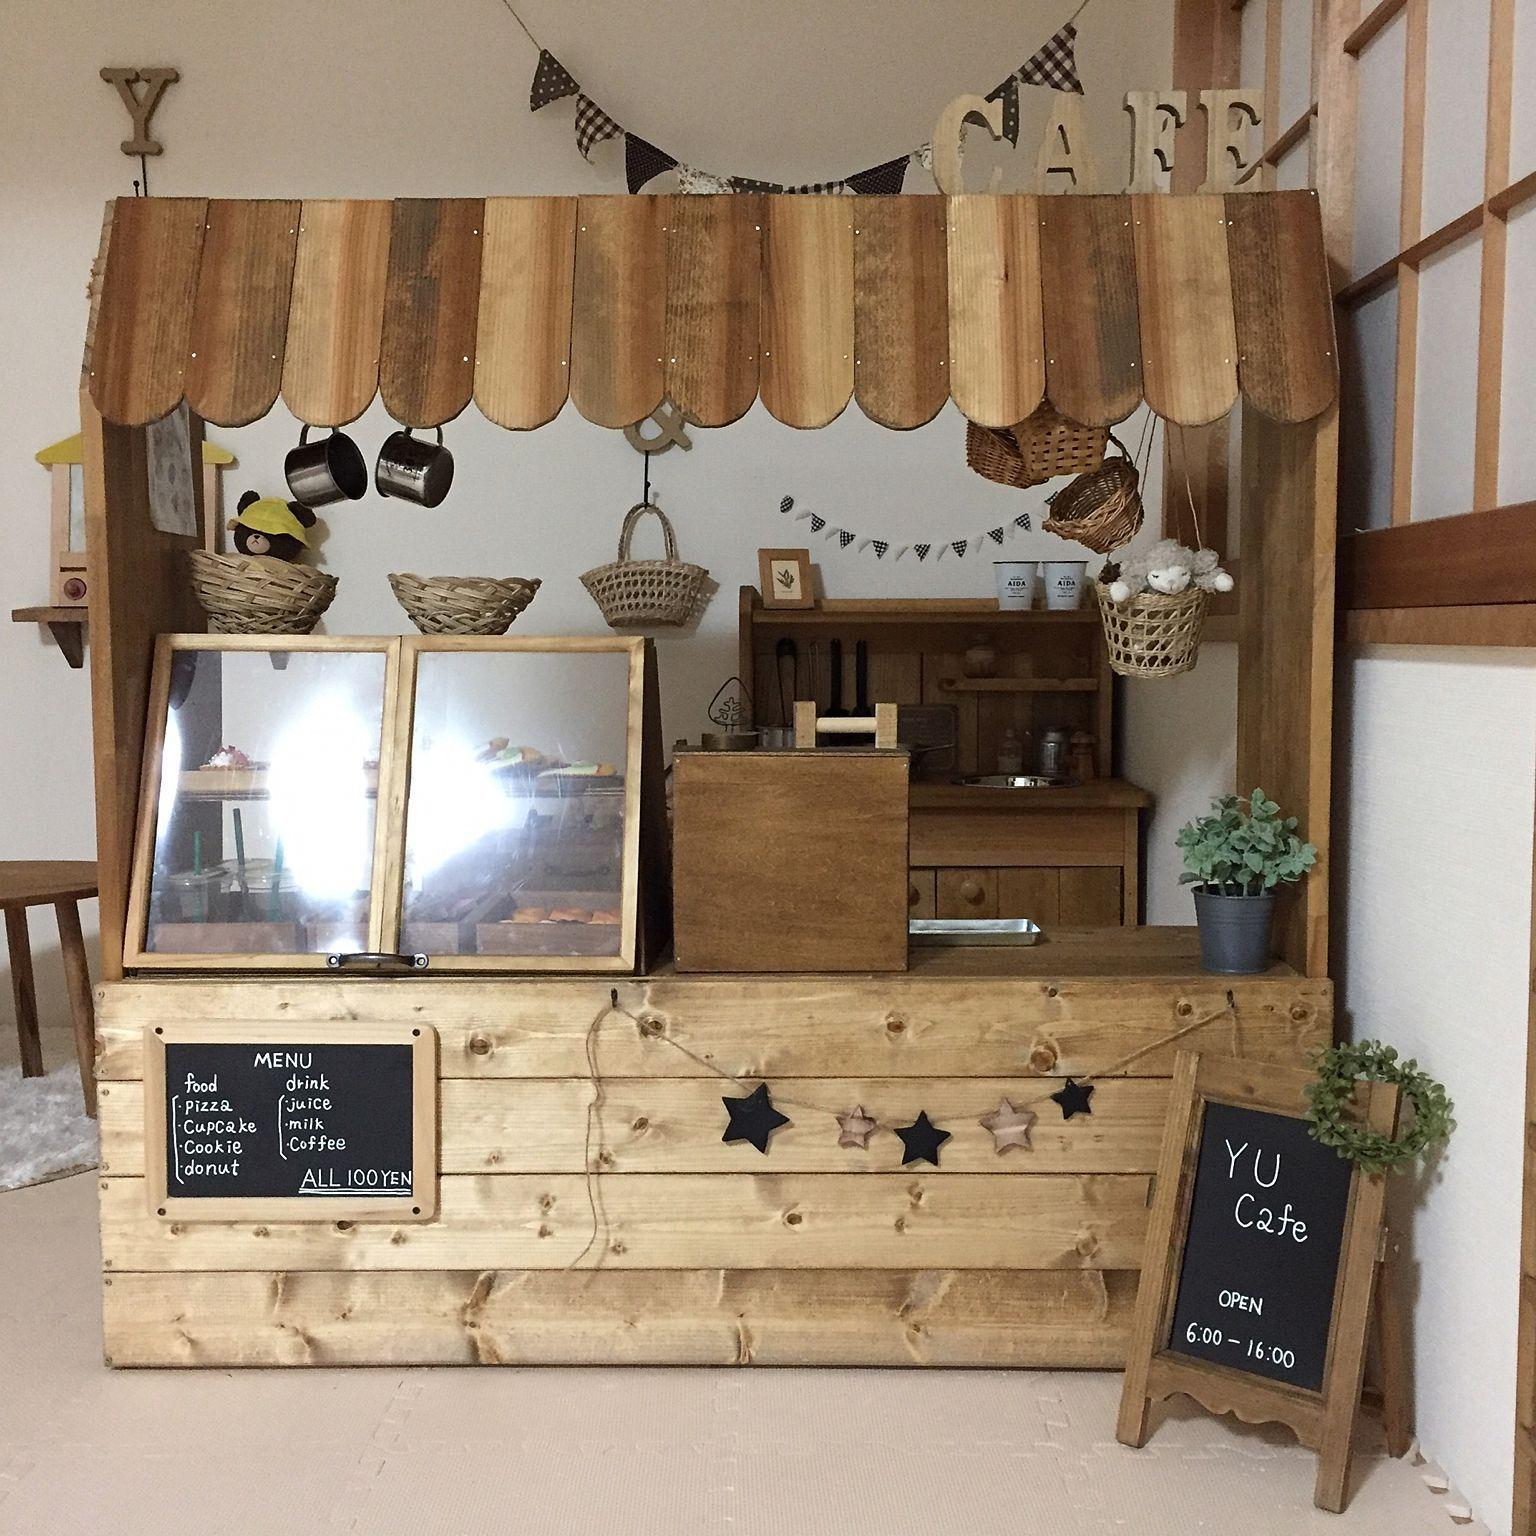 Where To Buy Cafe Kid Furniture: DIY/セリア/部屋全体/100均/ダイソー/ハンドメイド...などのインテリア実例